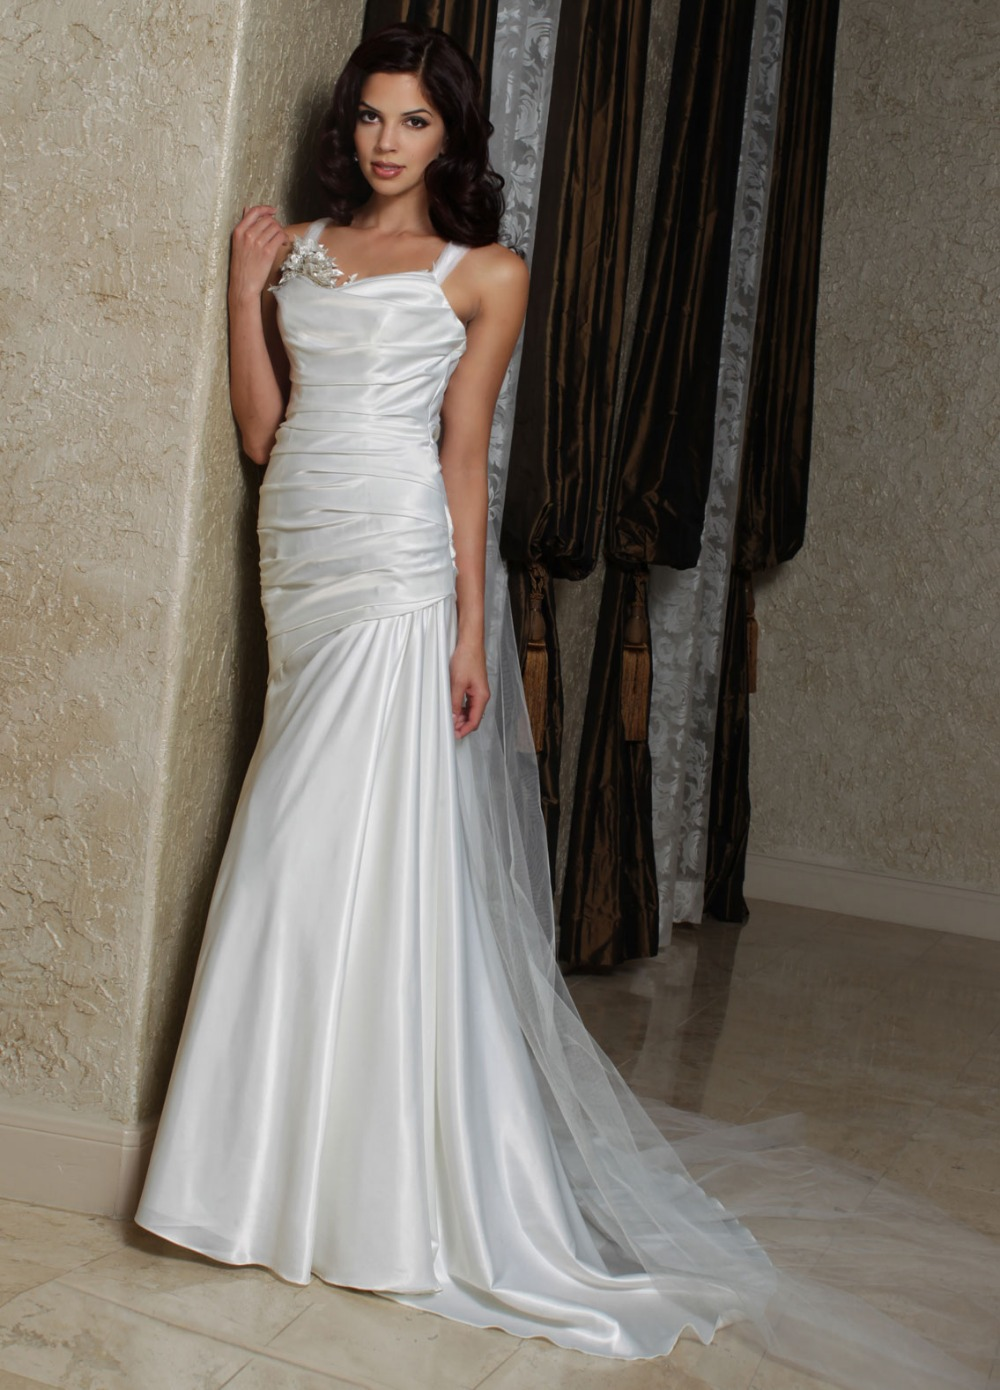 vegas wedding dresses vegas wedding dresses las vegas wedding dresses